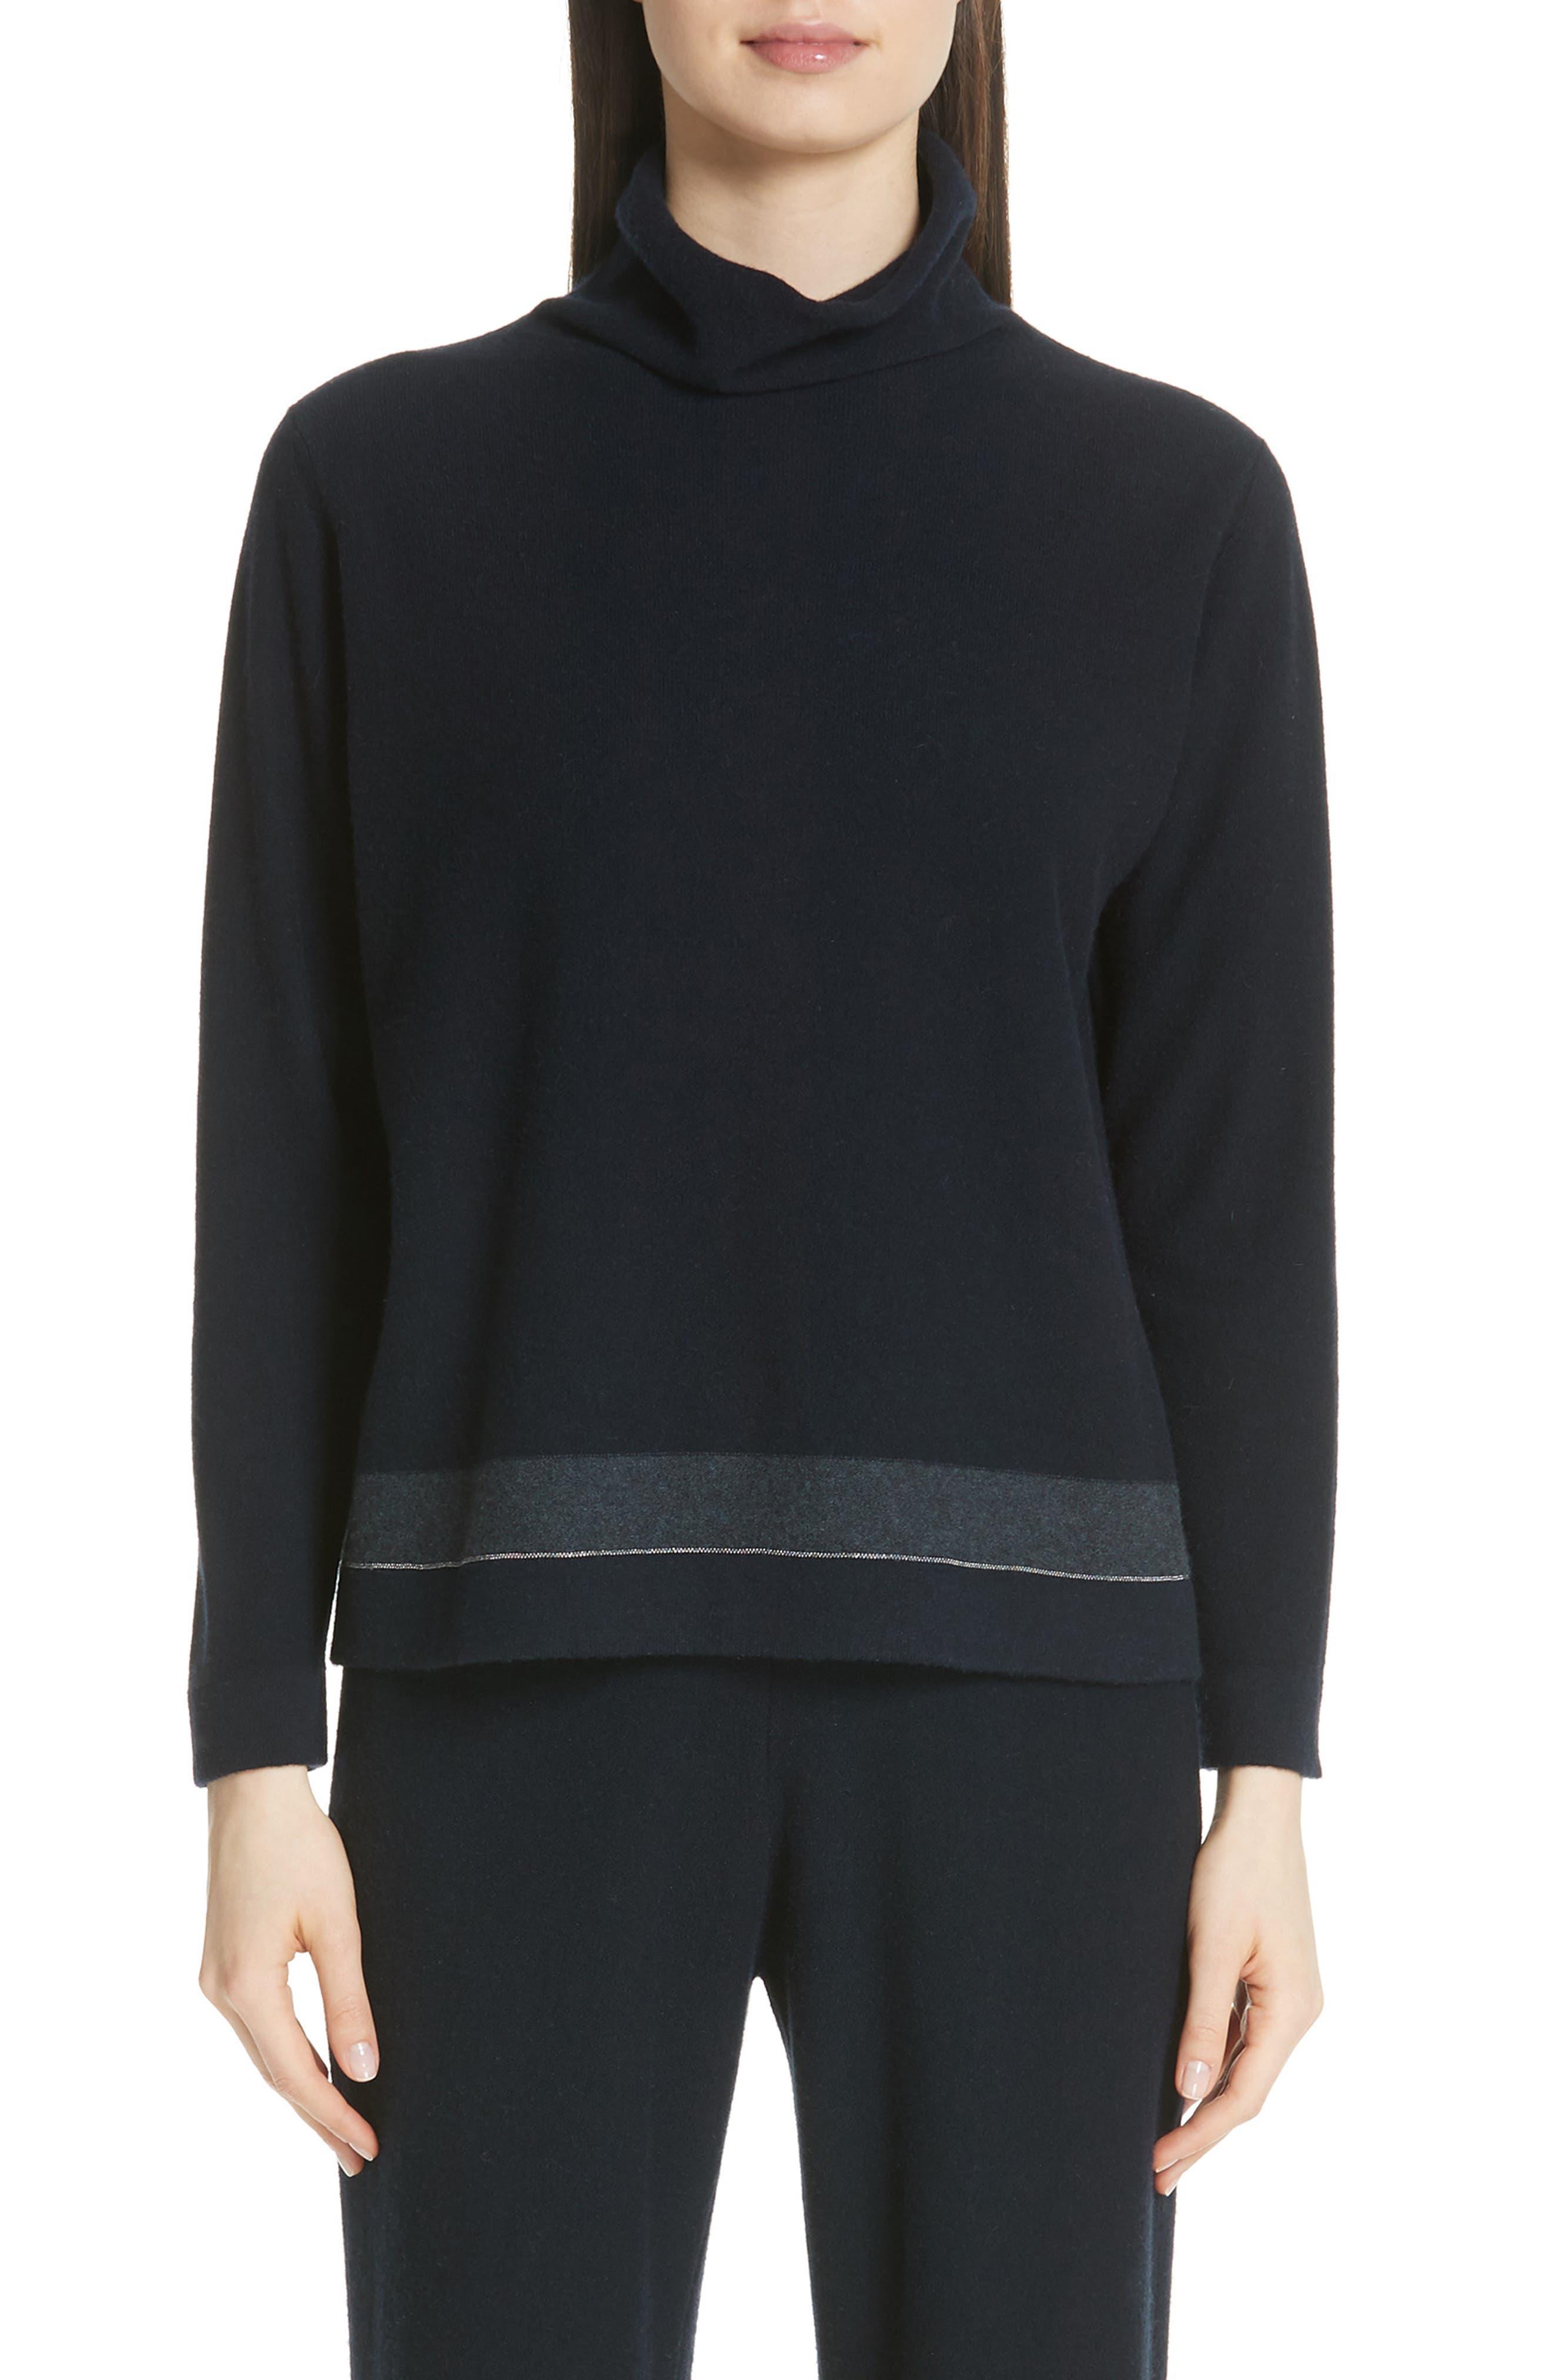 Bead Detail Cashmere Turtleneck Sweater,                             Main thumbnail 1, color,                             NIGHT BLUE